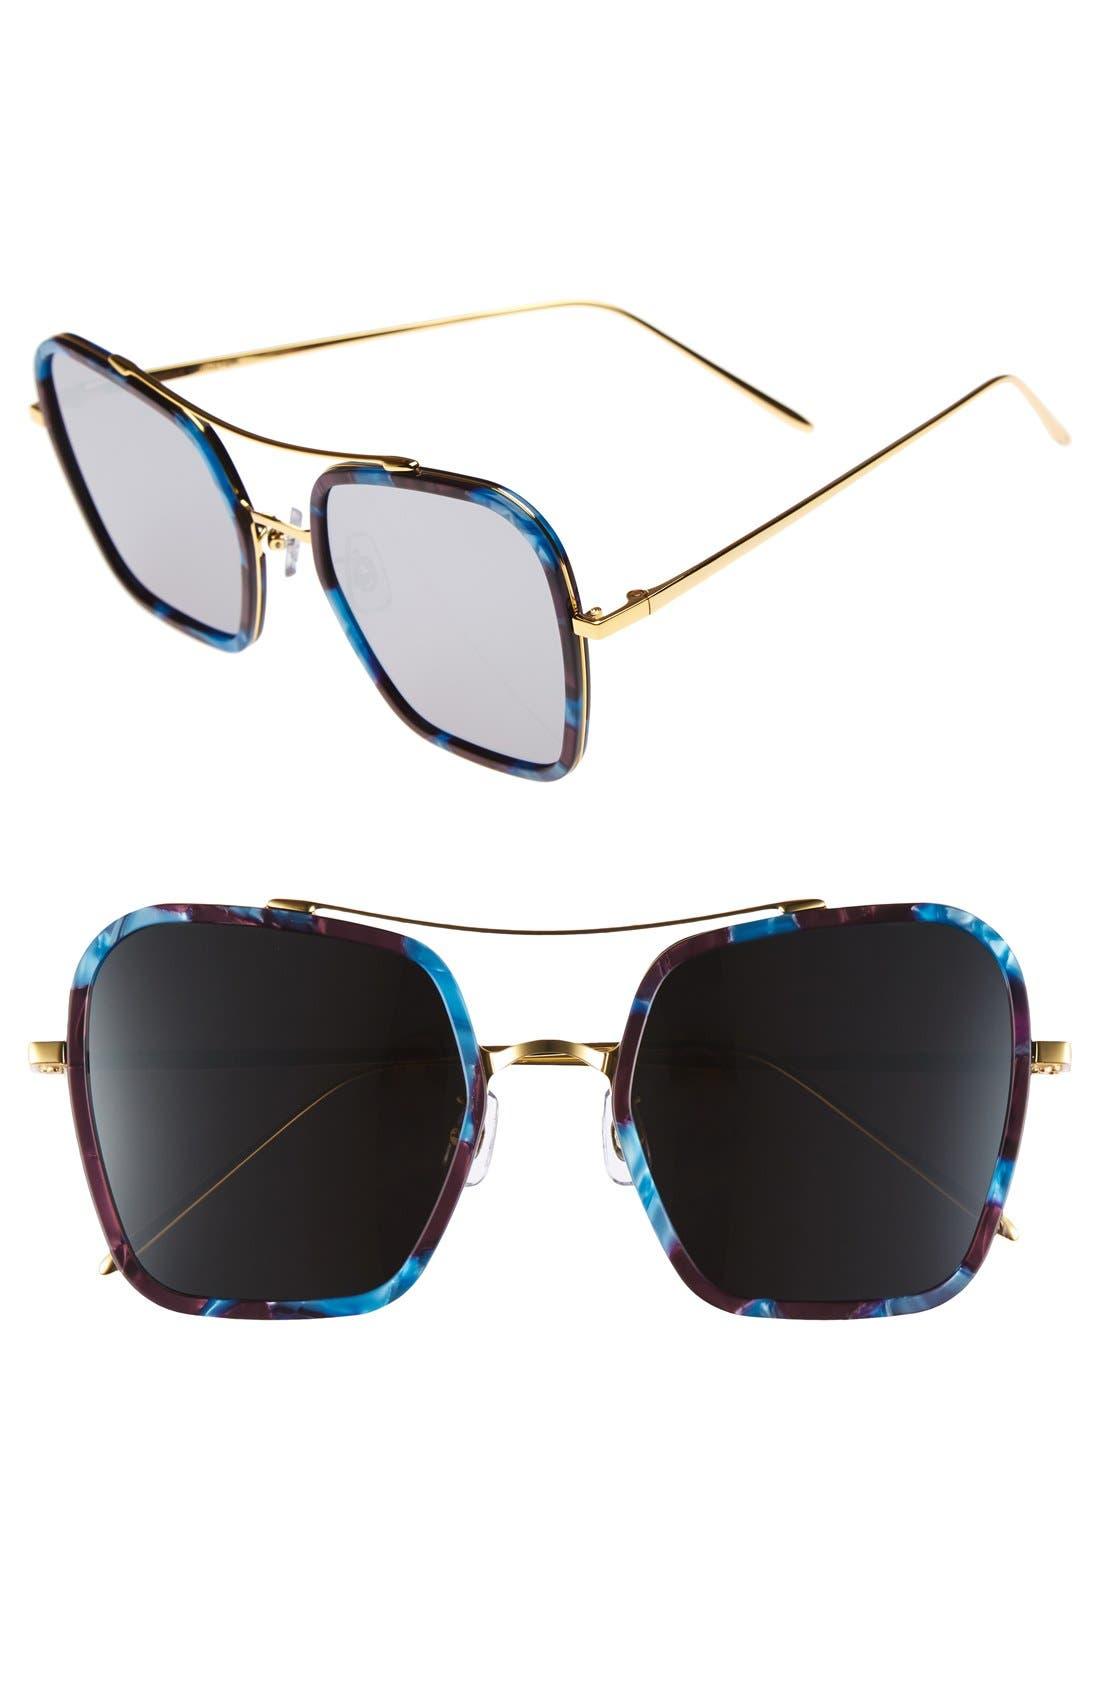 GENTLE MONSTER 53mm Retro Square Sunglasses